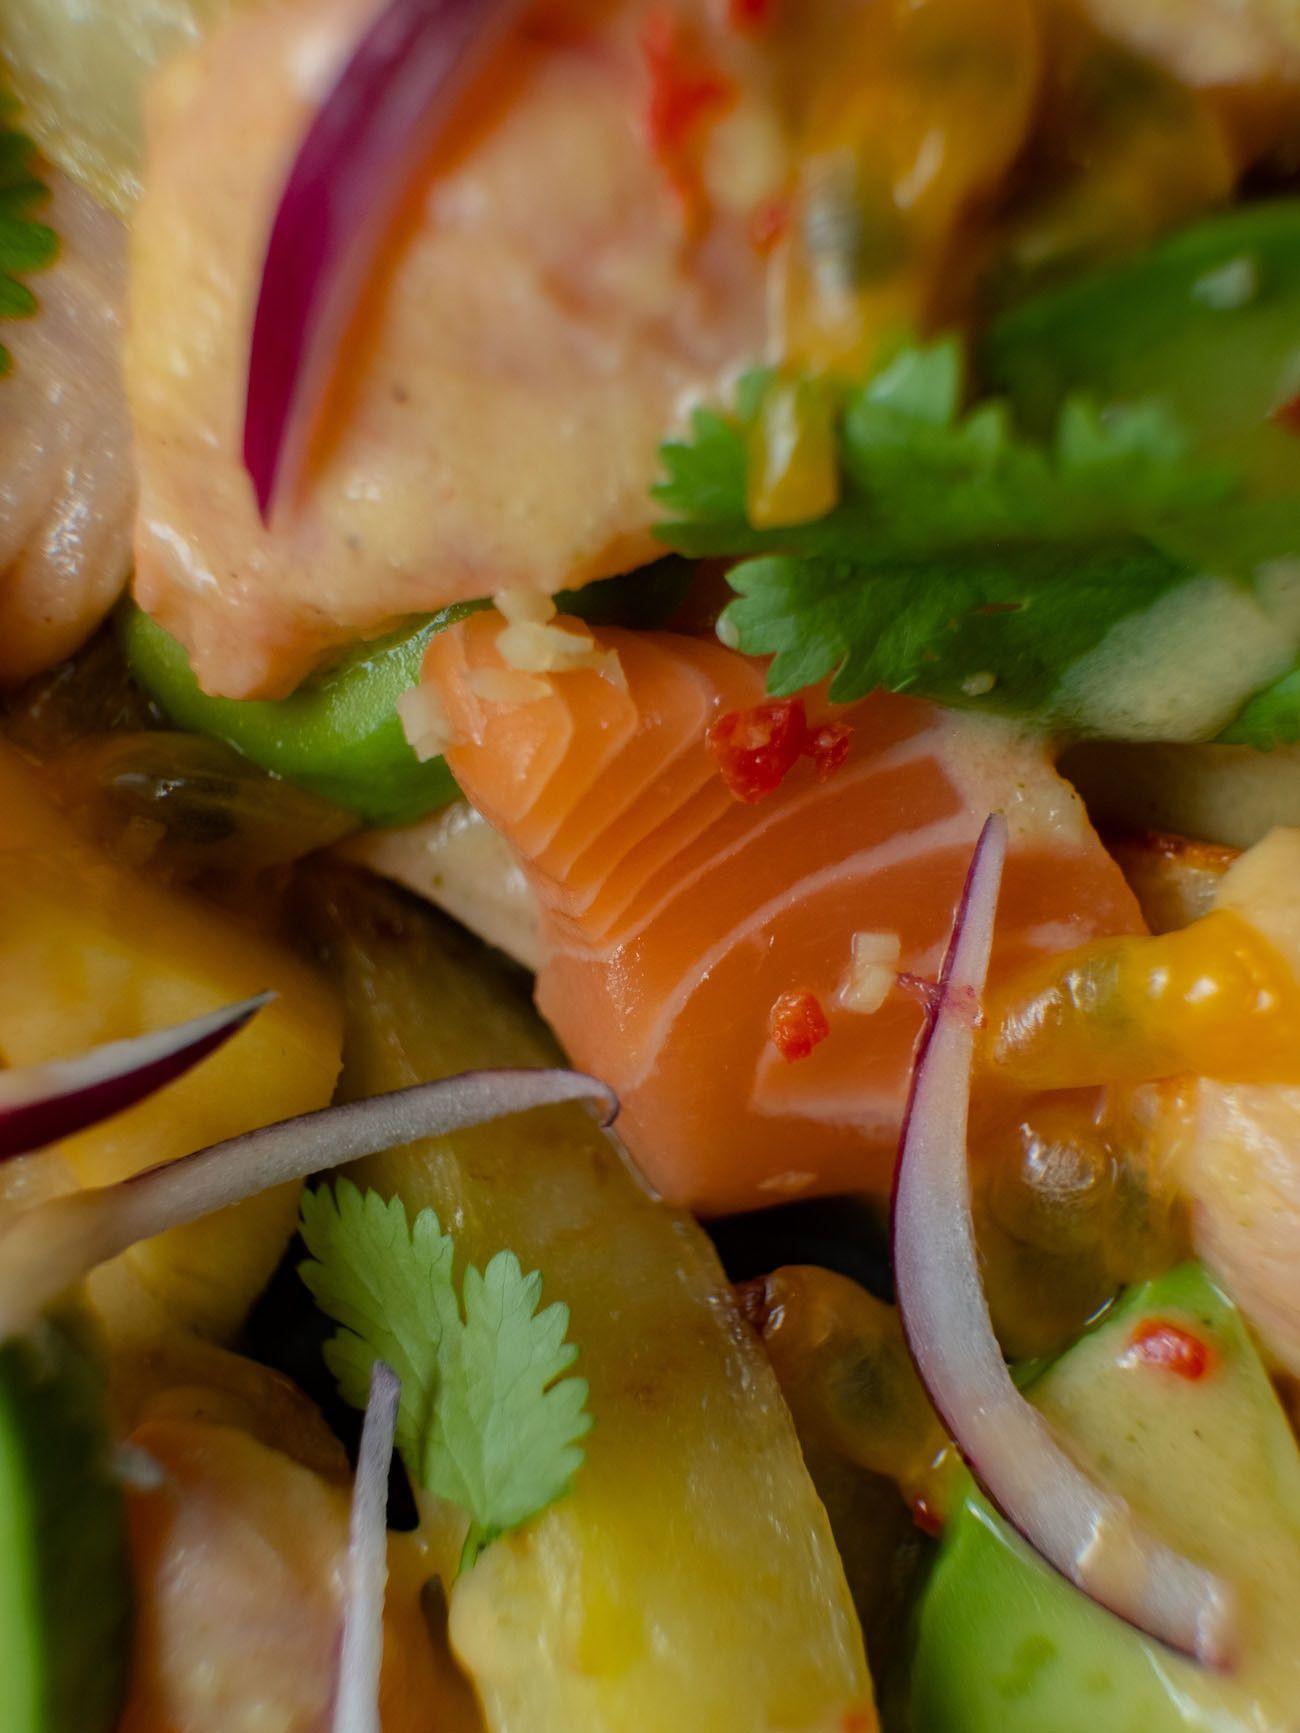 Foodblog, About Fuel, CEVICHE Das Kochbuch, Juan Danilo, Lachs, Kartoffeln